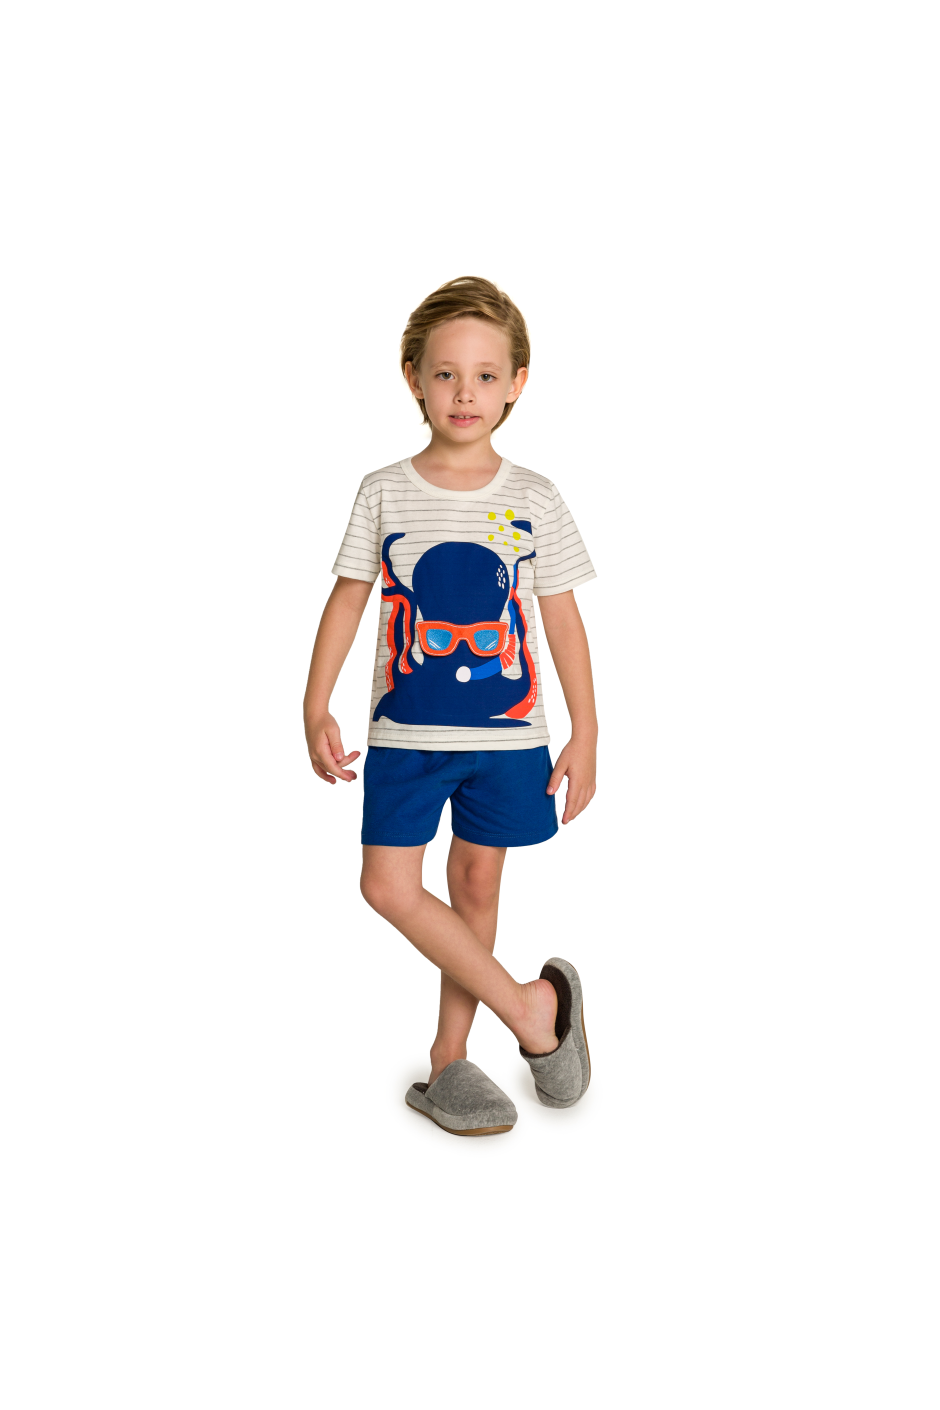 010/G - Pijama Infantil Polvo com Óculos Interativo